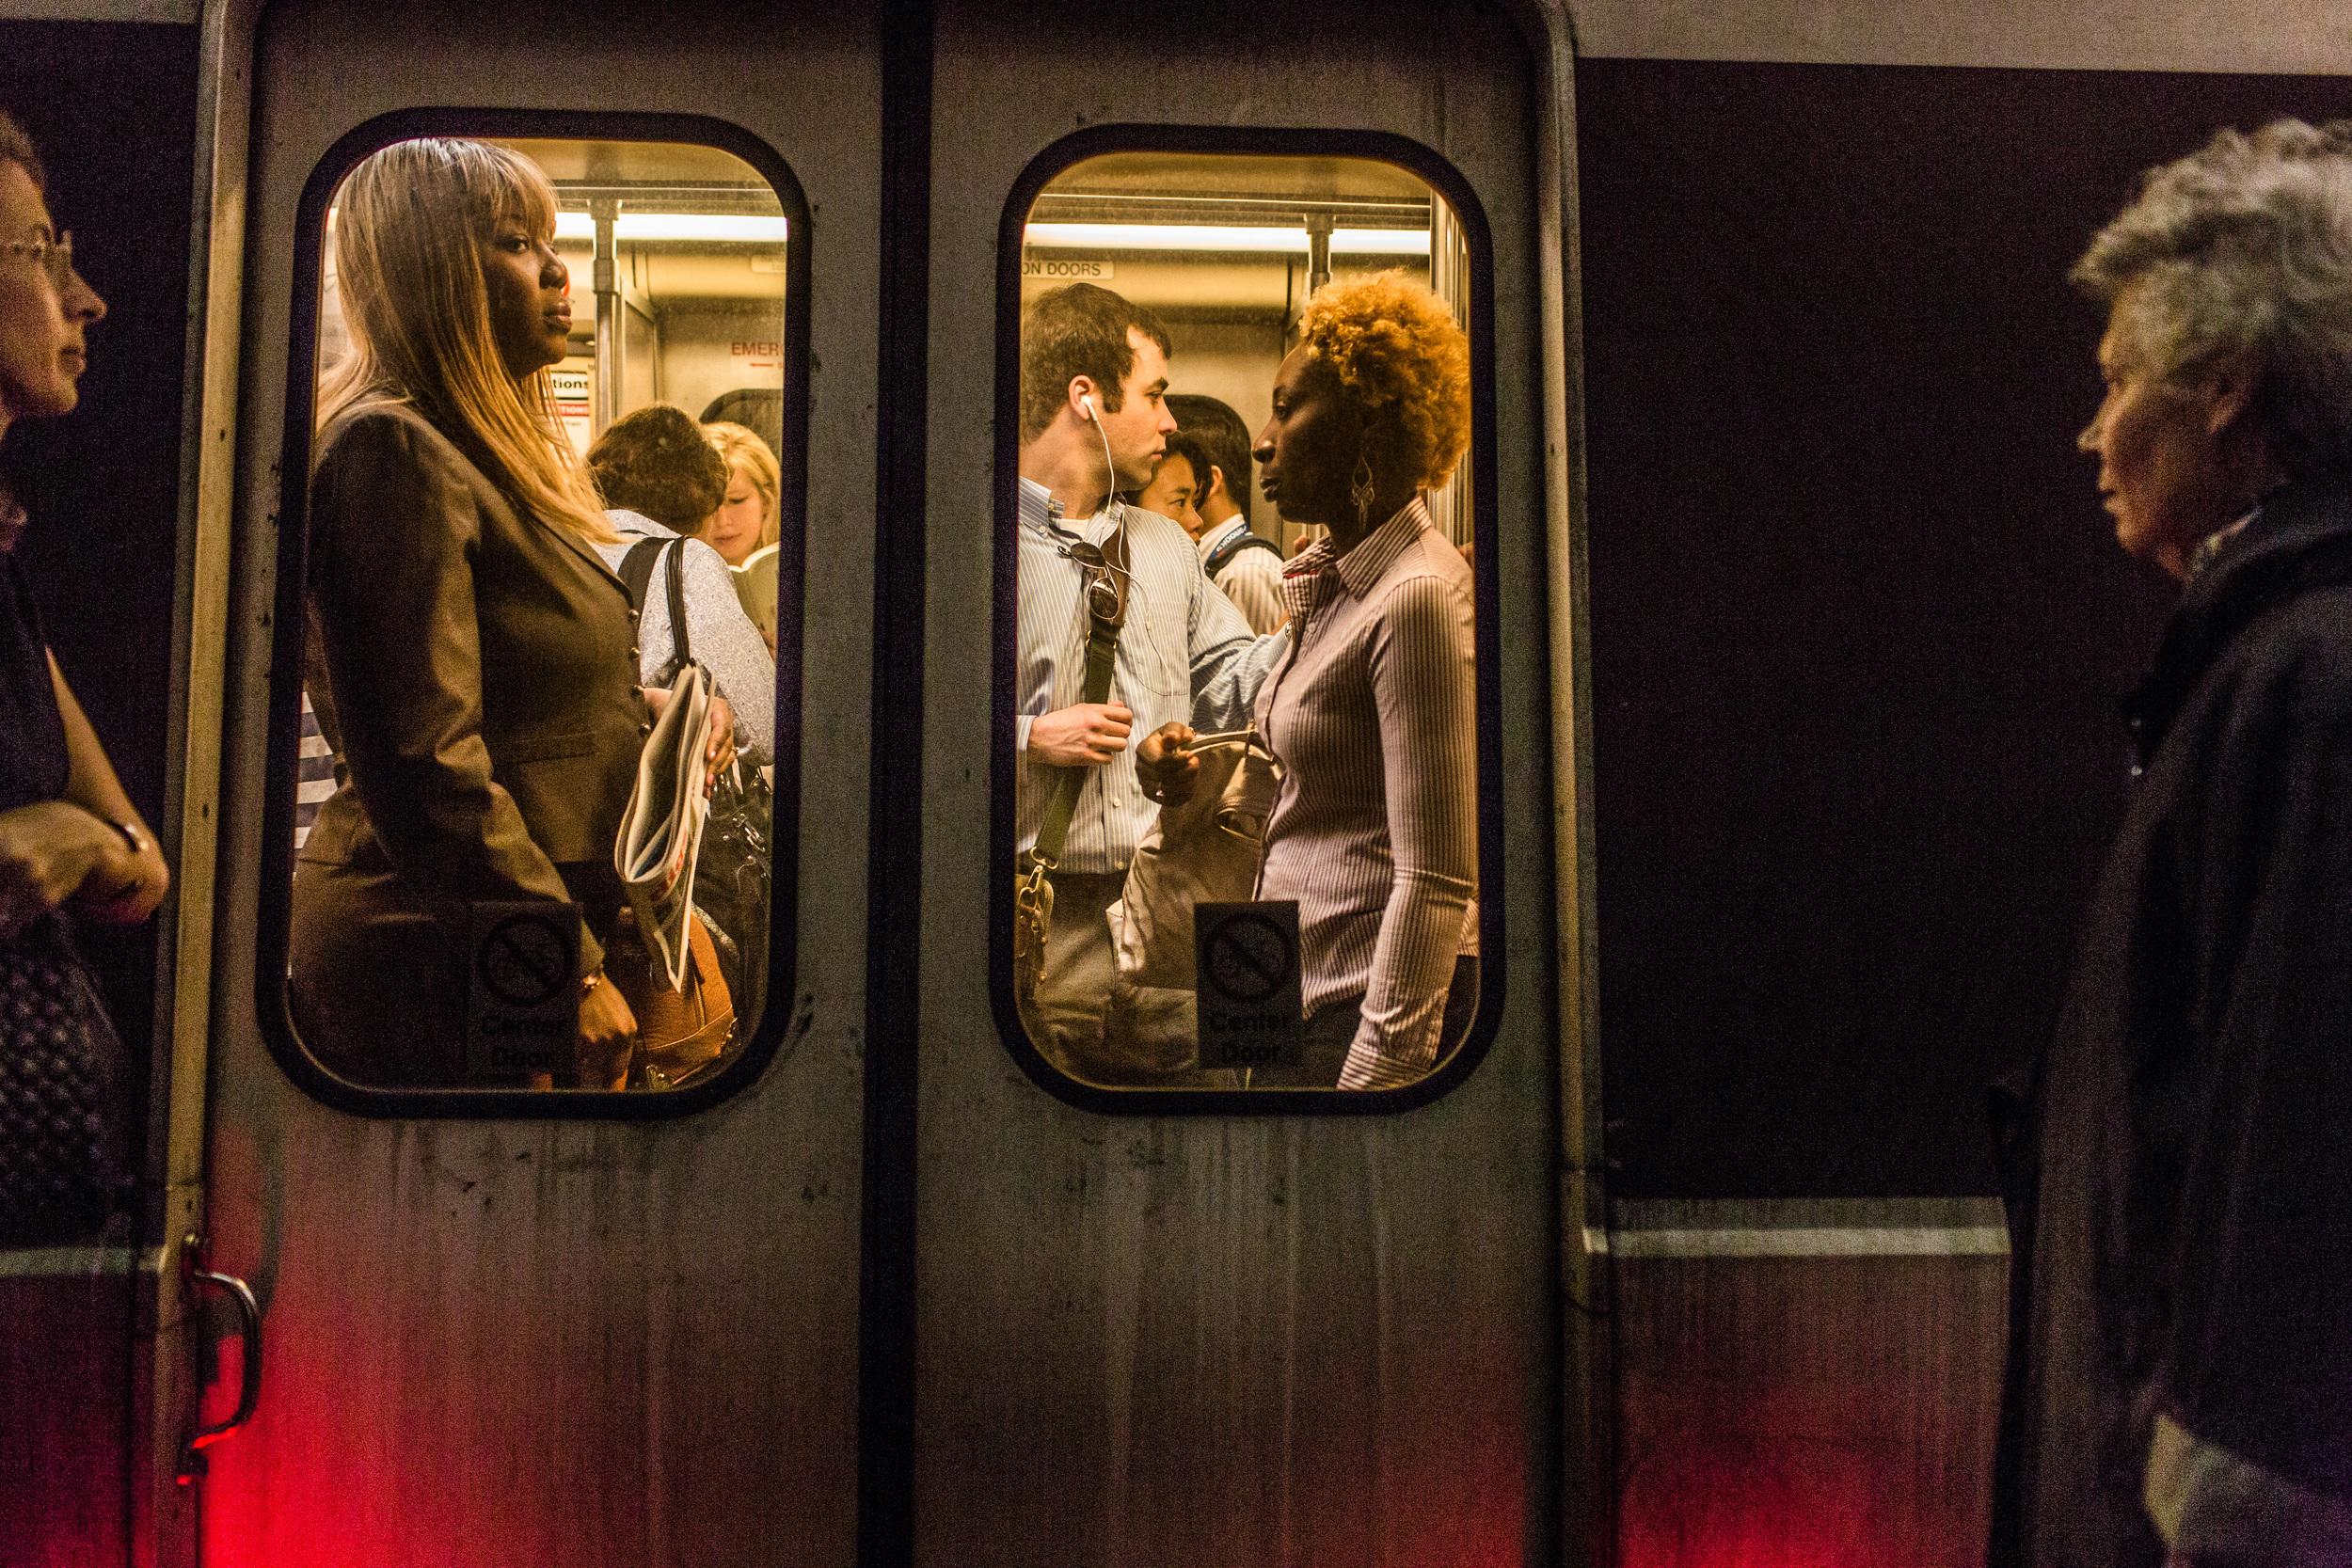 Washington DC Metro System